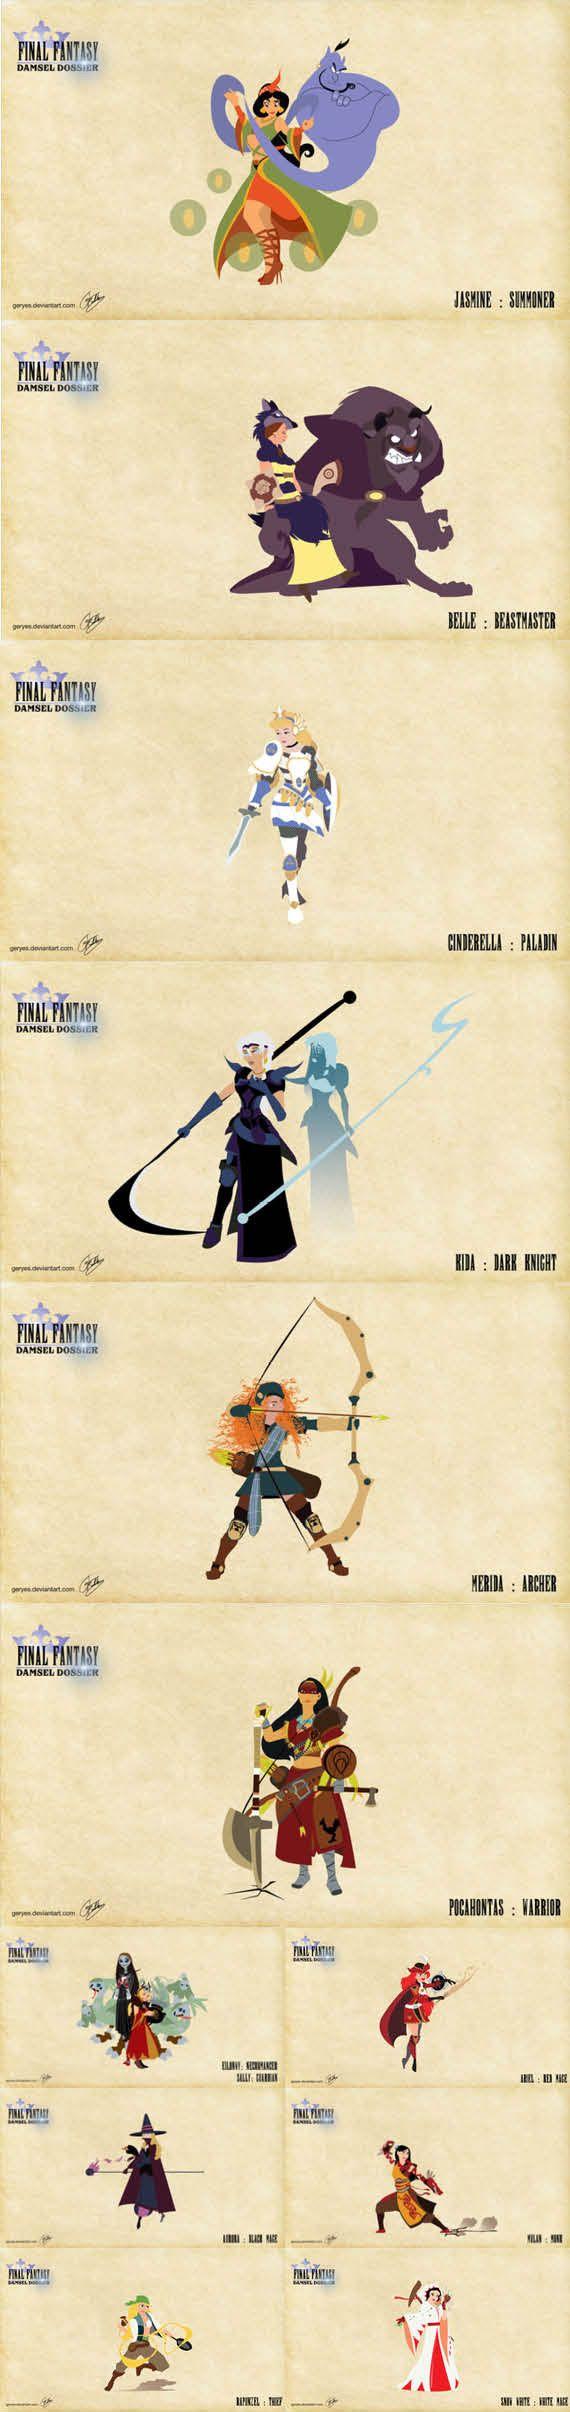 #Disney characters and made up to look like as #FinalFantasy Job Classes! #DeviantArt http://www.levelgamingground.com/disney-and-final-fantasy-news.html